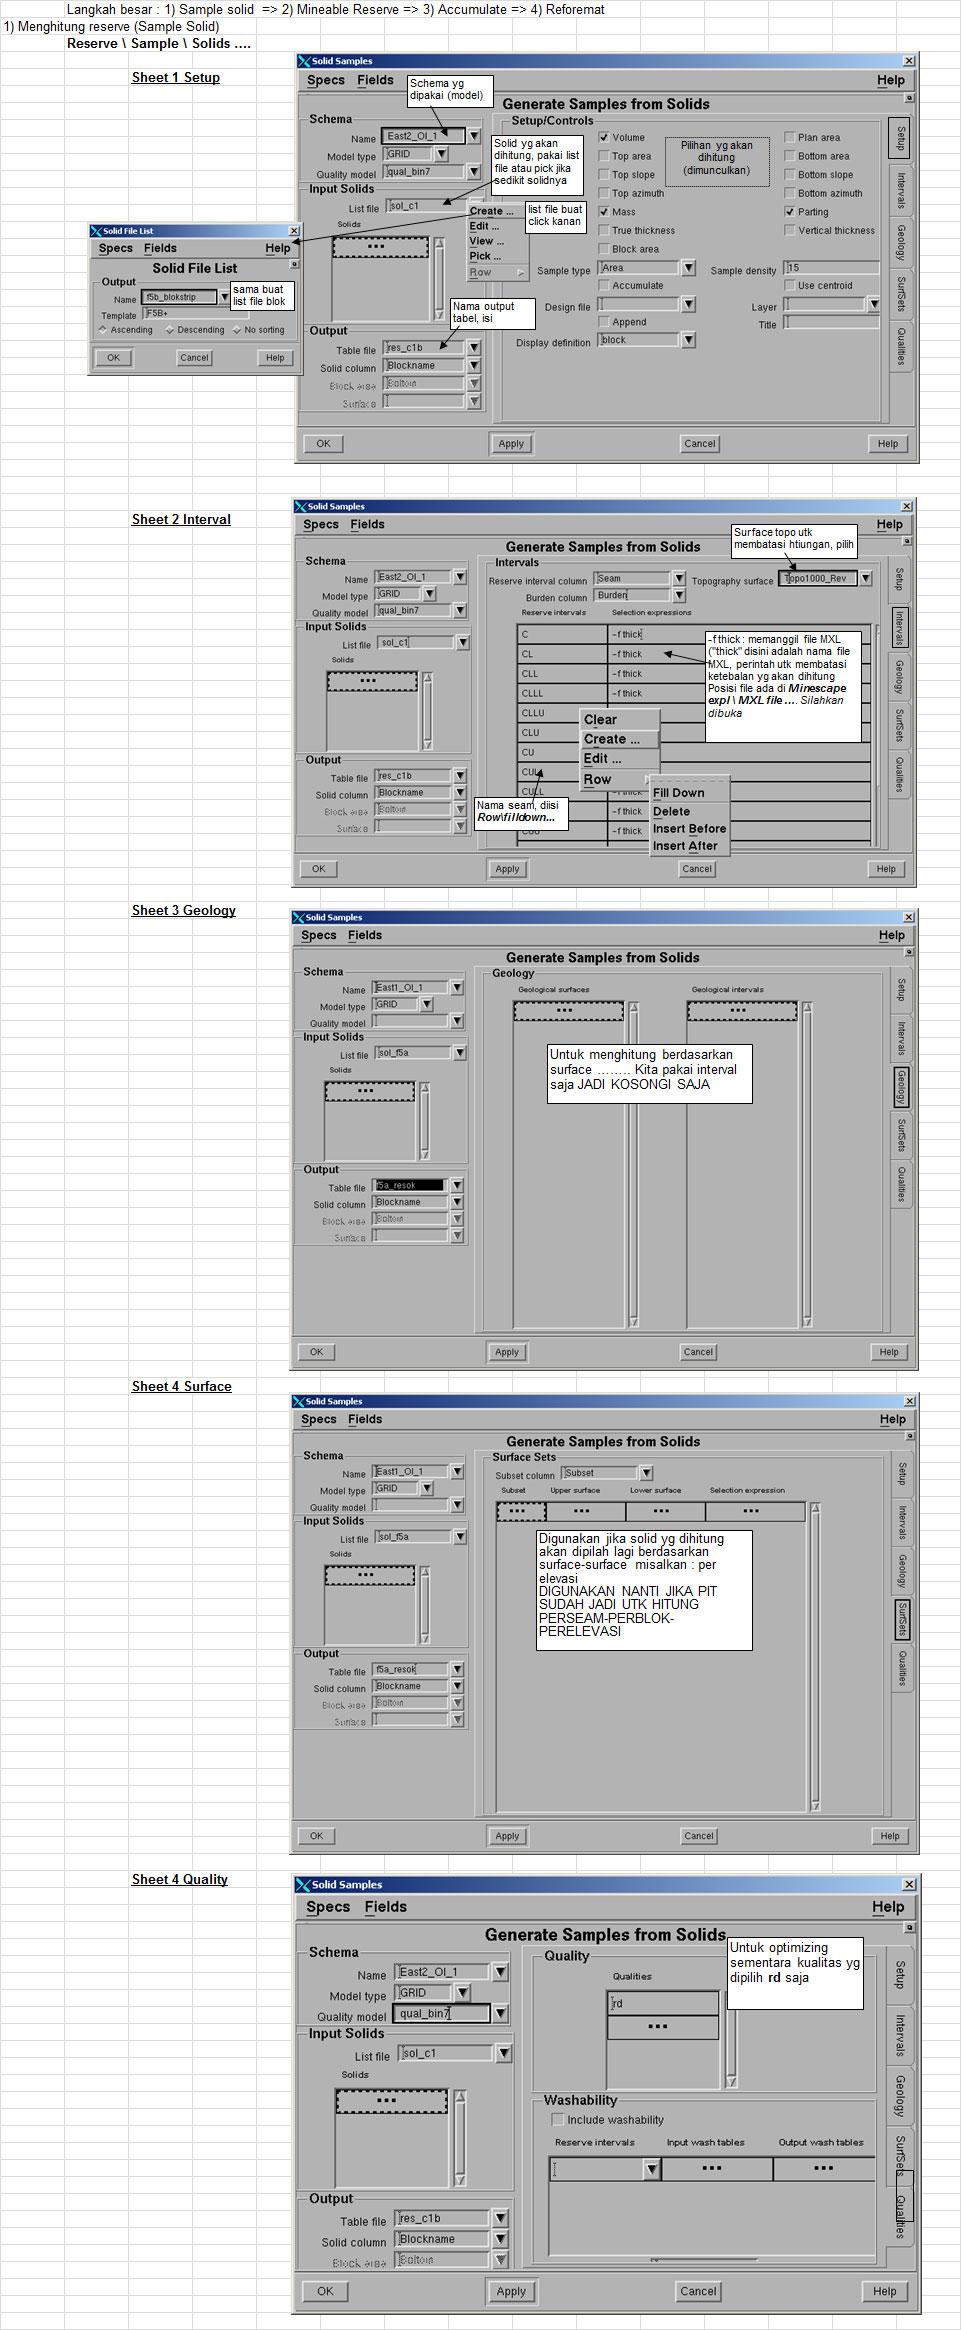 Menghitung Volume Reserves - Pit Optimizing di Minescape